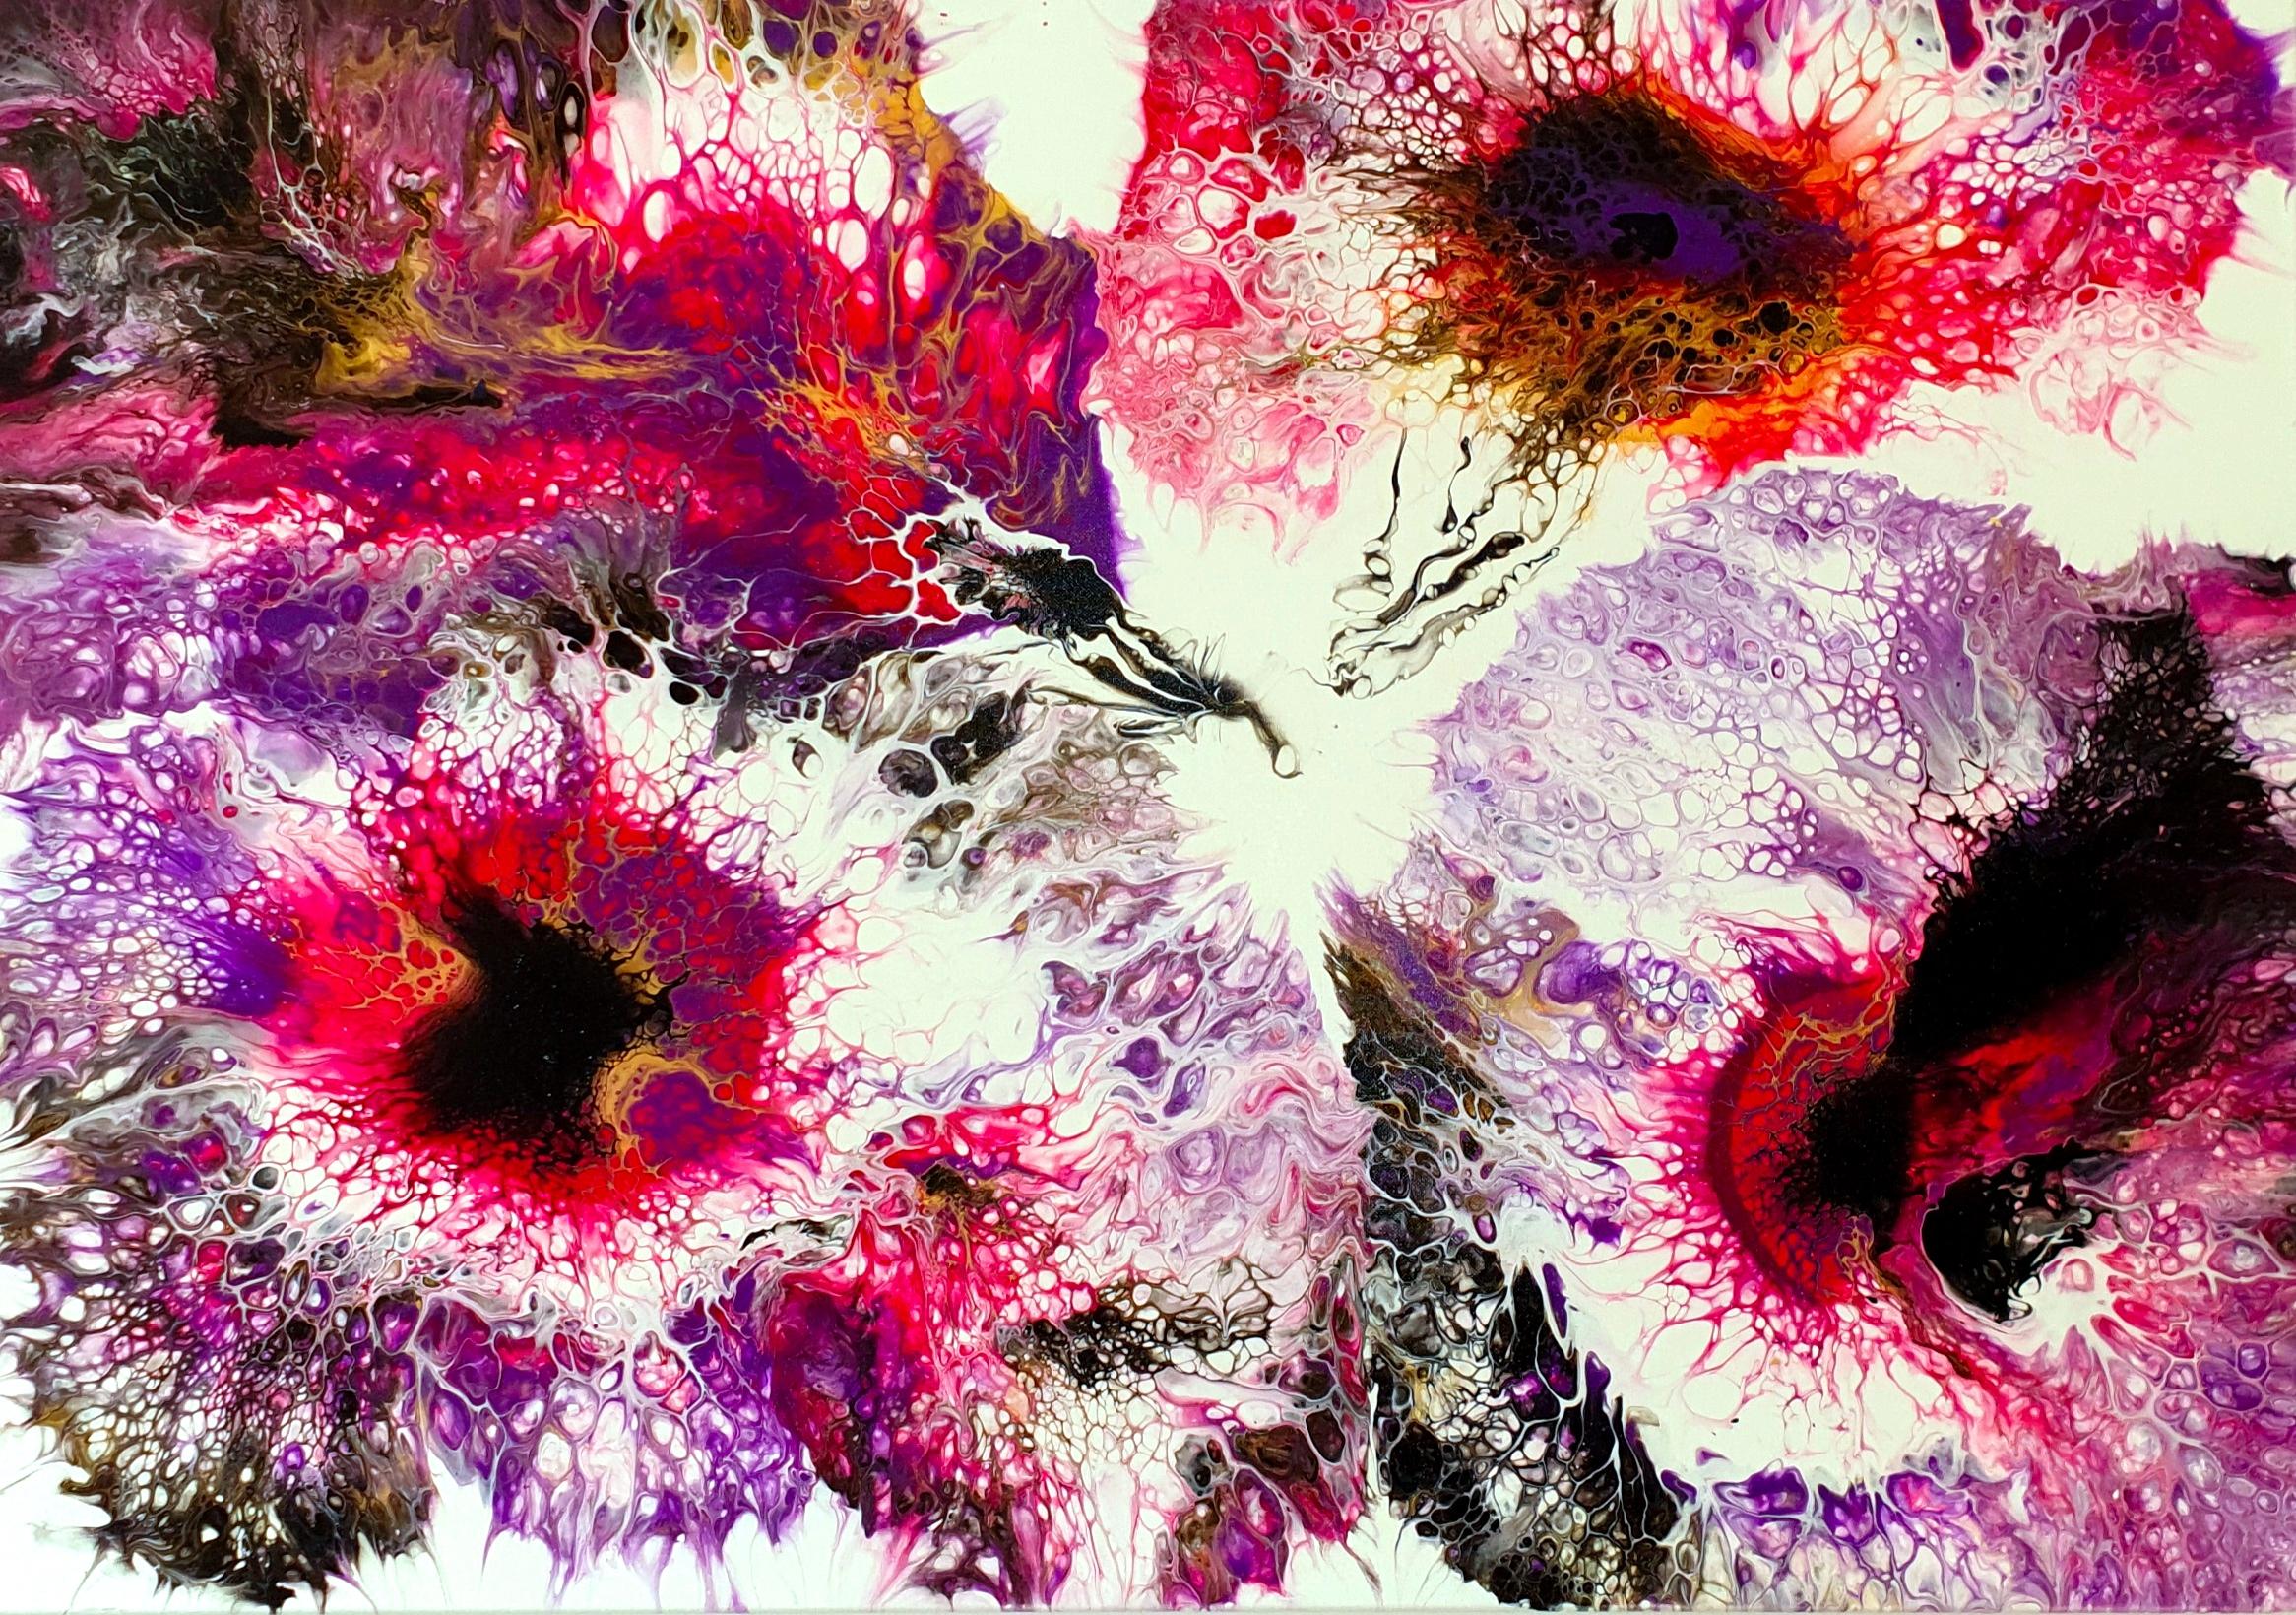 "Obraz akryl 100cm x 70cm pt.""Chemia miłości"" (2020)"